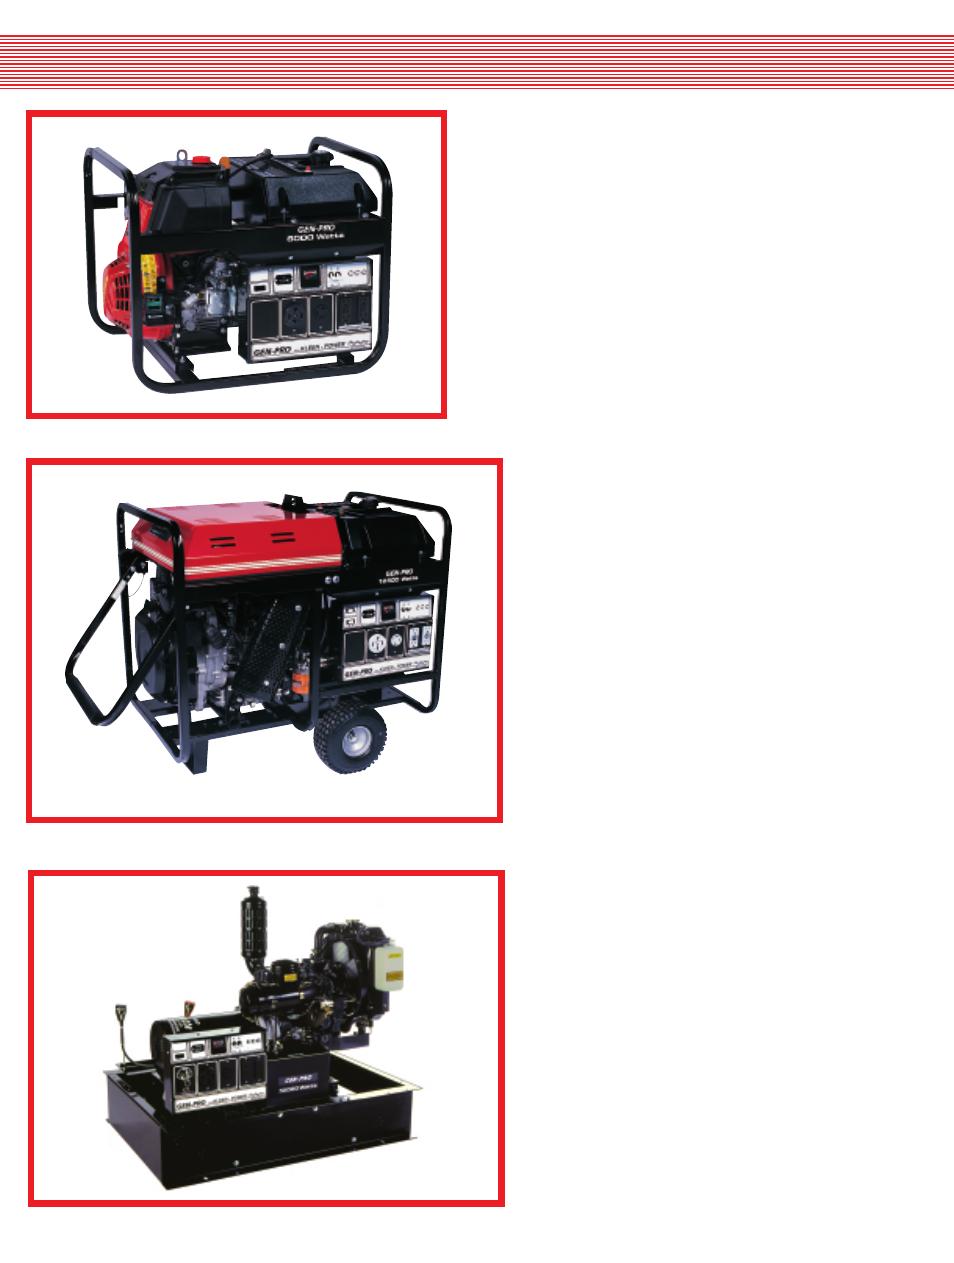 Diesel Generators Gillette Portable User Manual Page Lombardini Fuel Filter 4 6